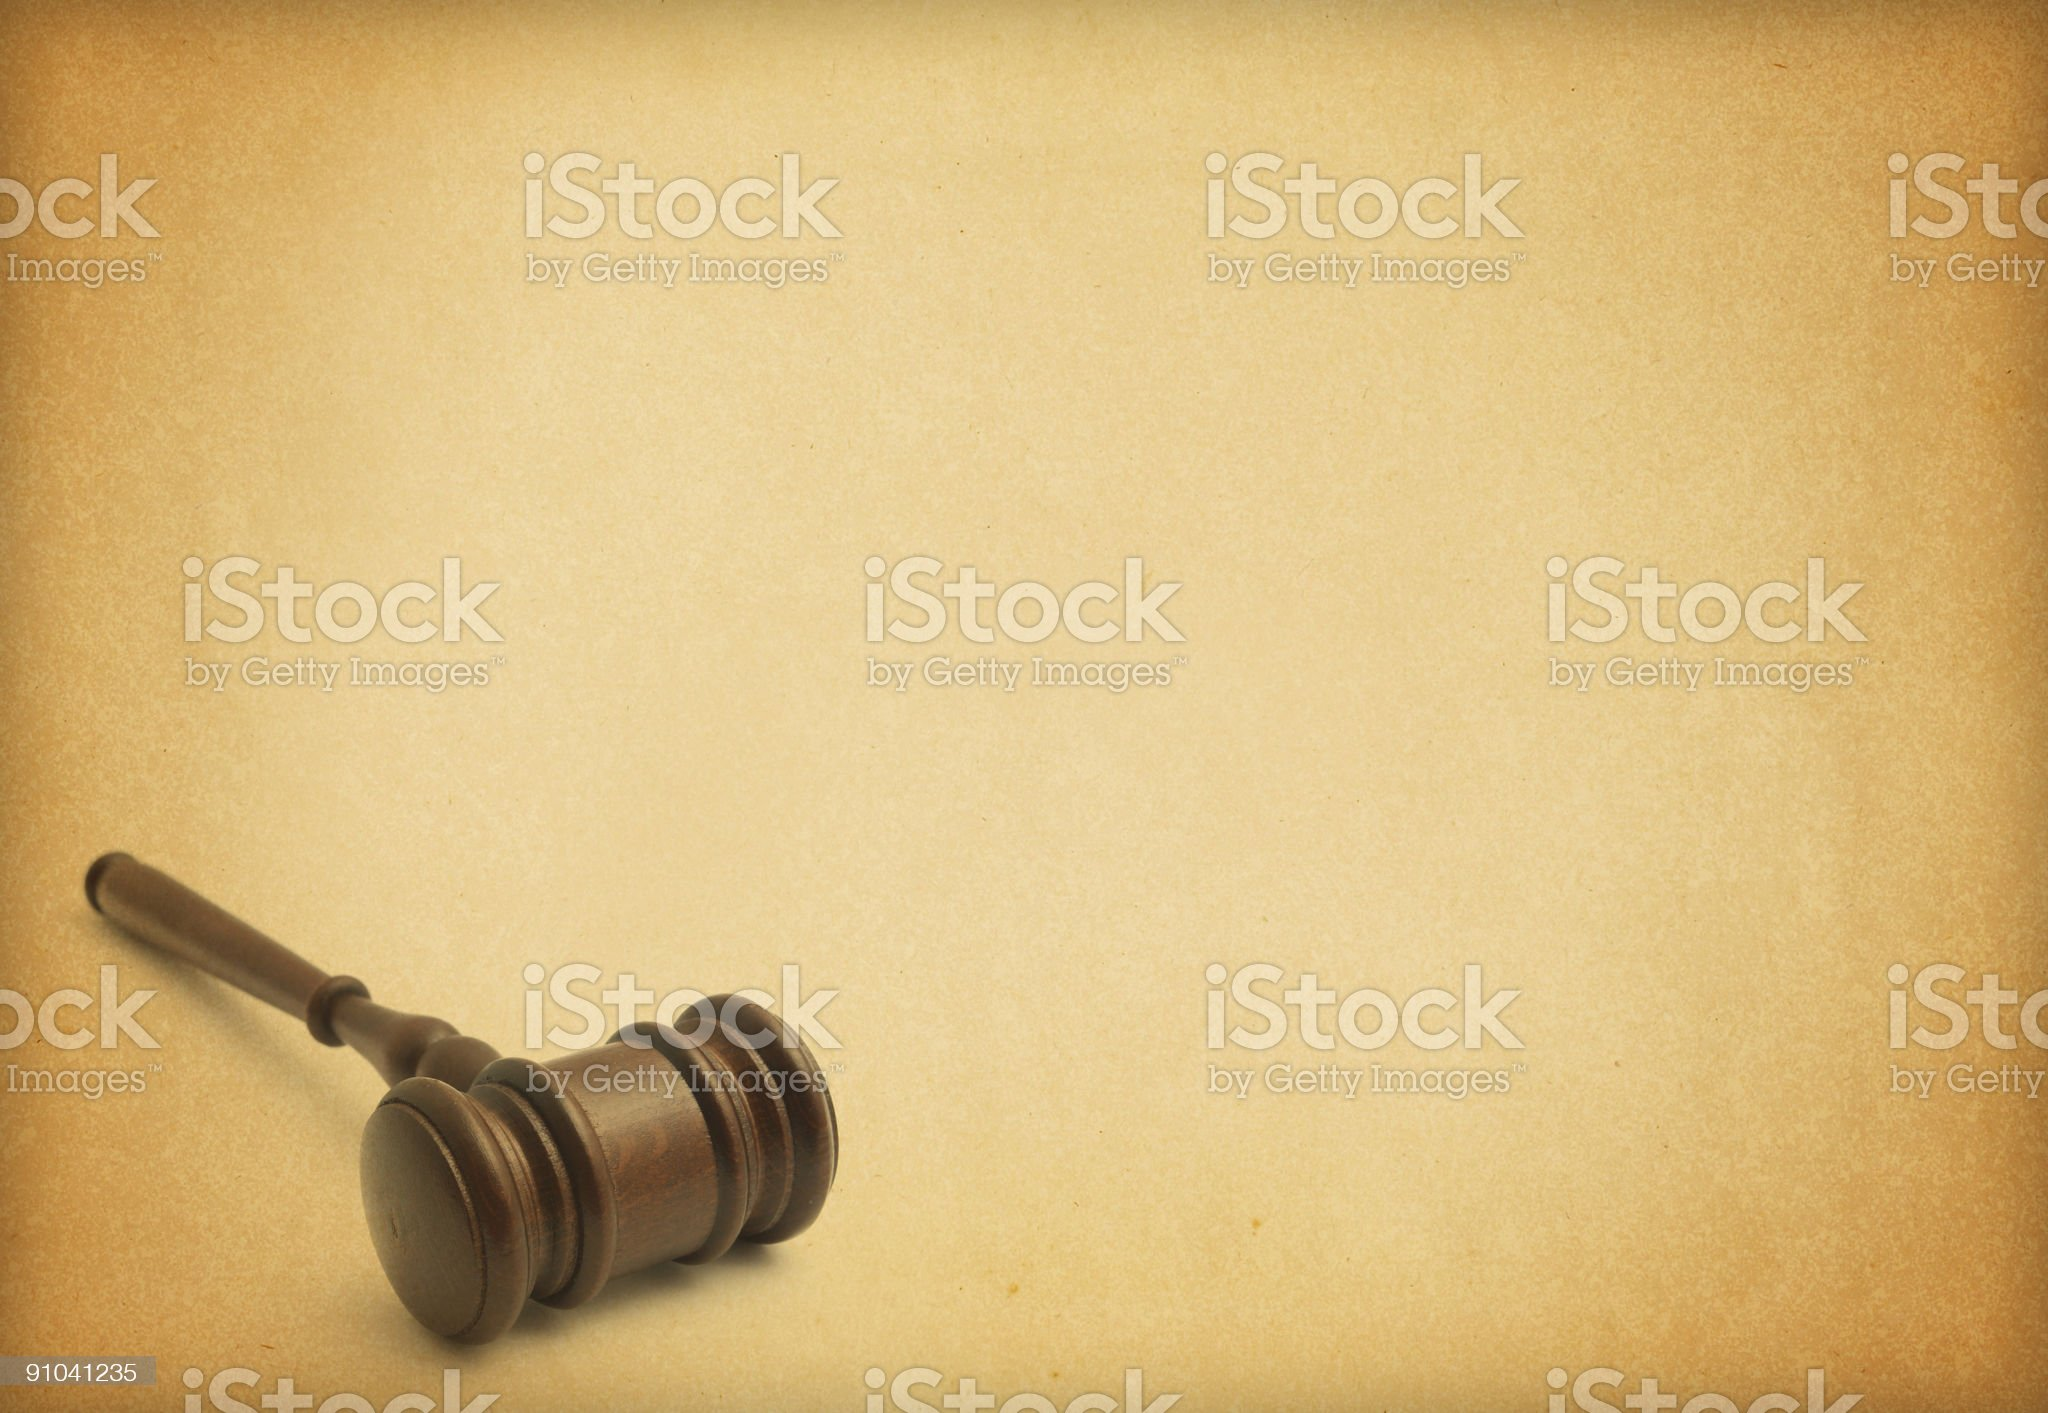 Judge Concept royalty-free stock photo